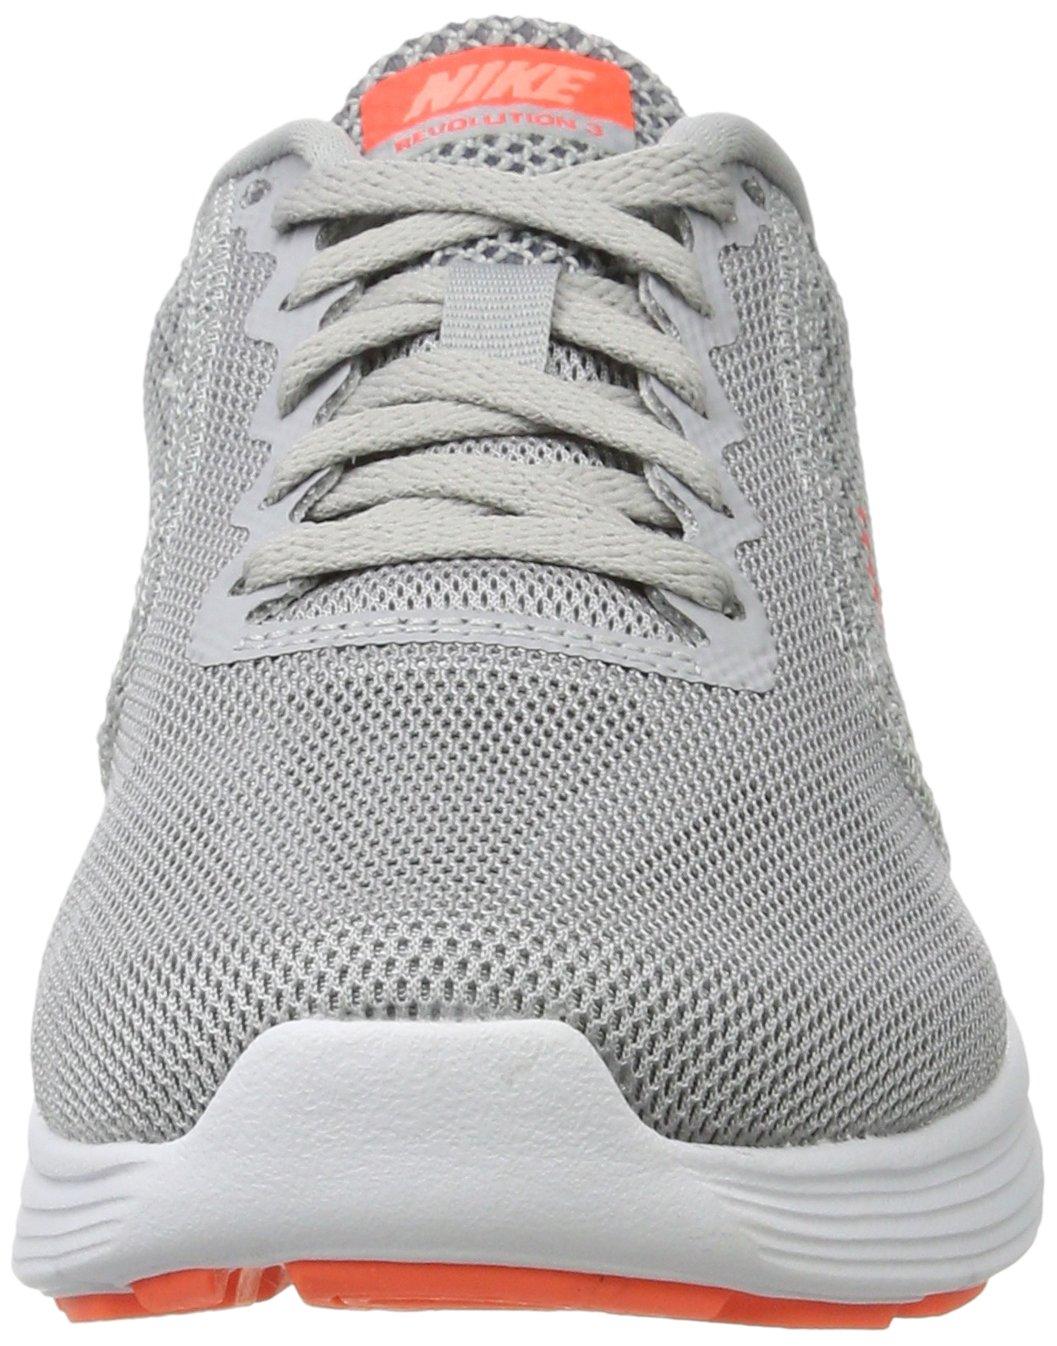 NIKE Women's Revolution 3 Running Shoe B0013VACBW 11 Grey C/D US|Wolf Grey/Hyper Orange/Cool Grey 11 5b637d